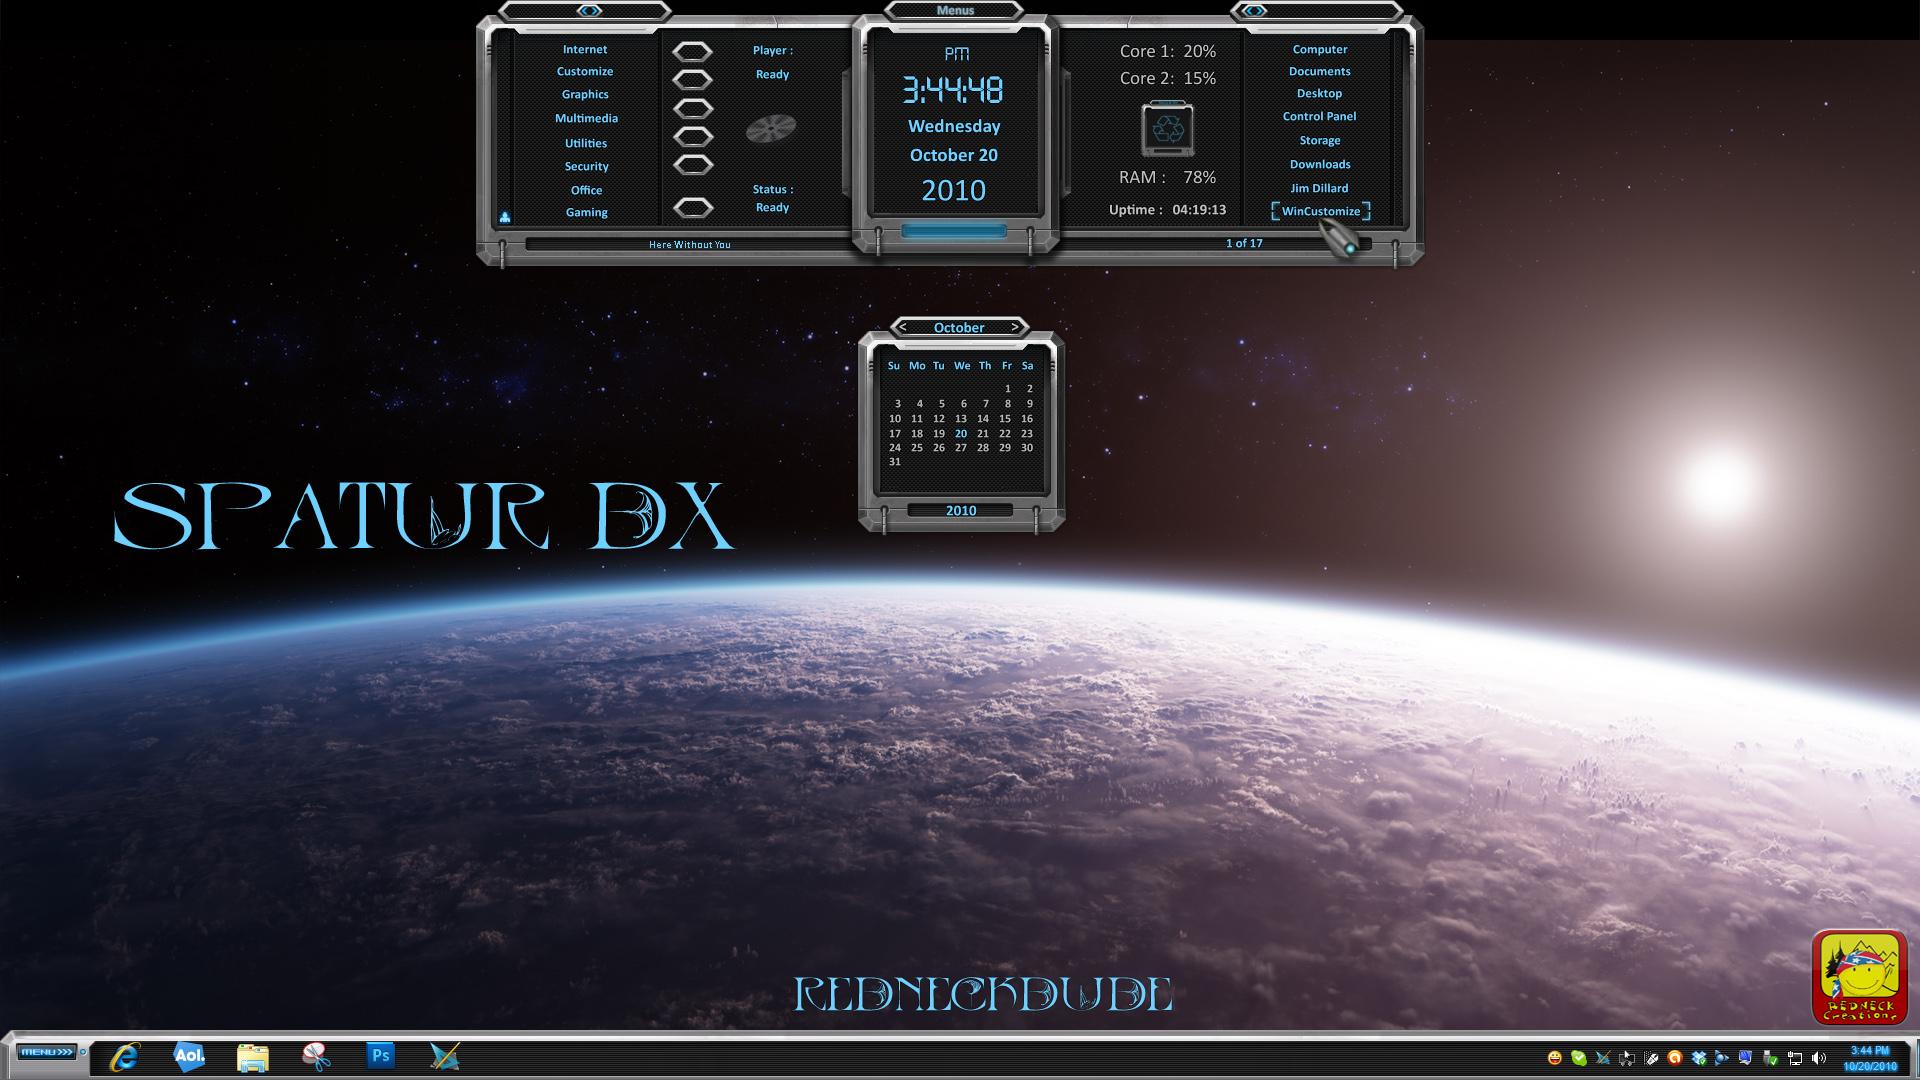 SPatur DX